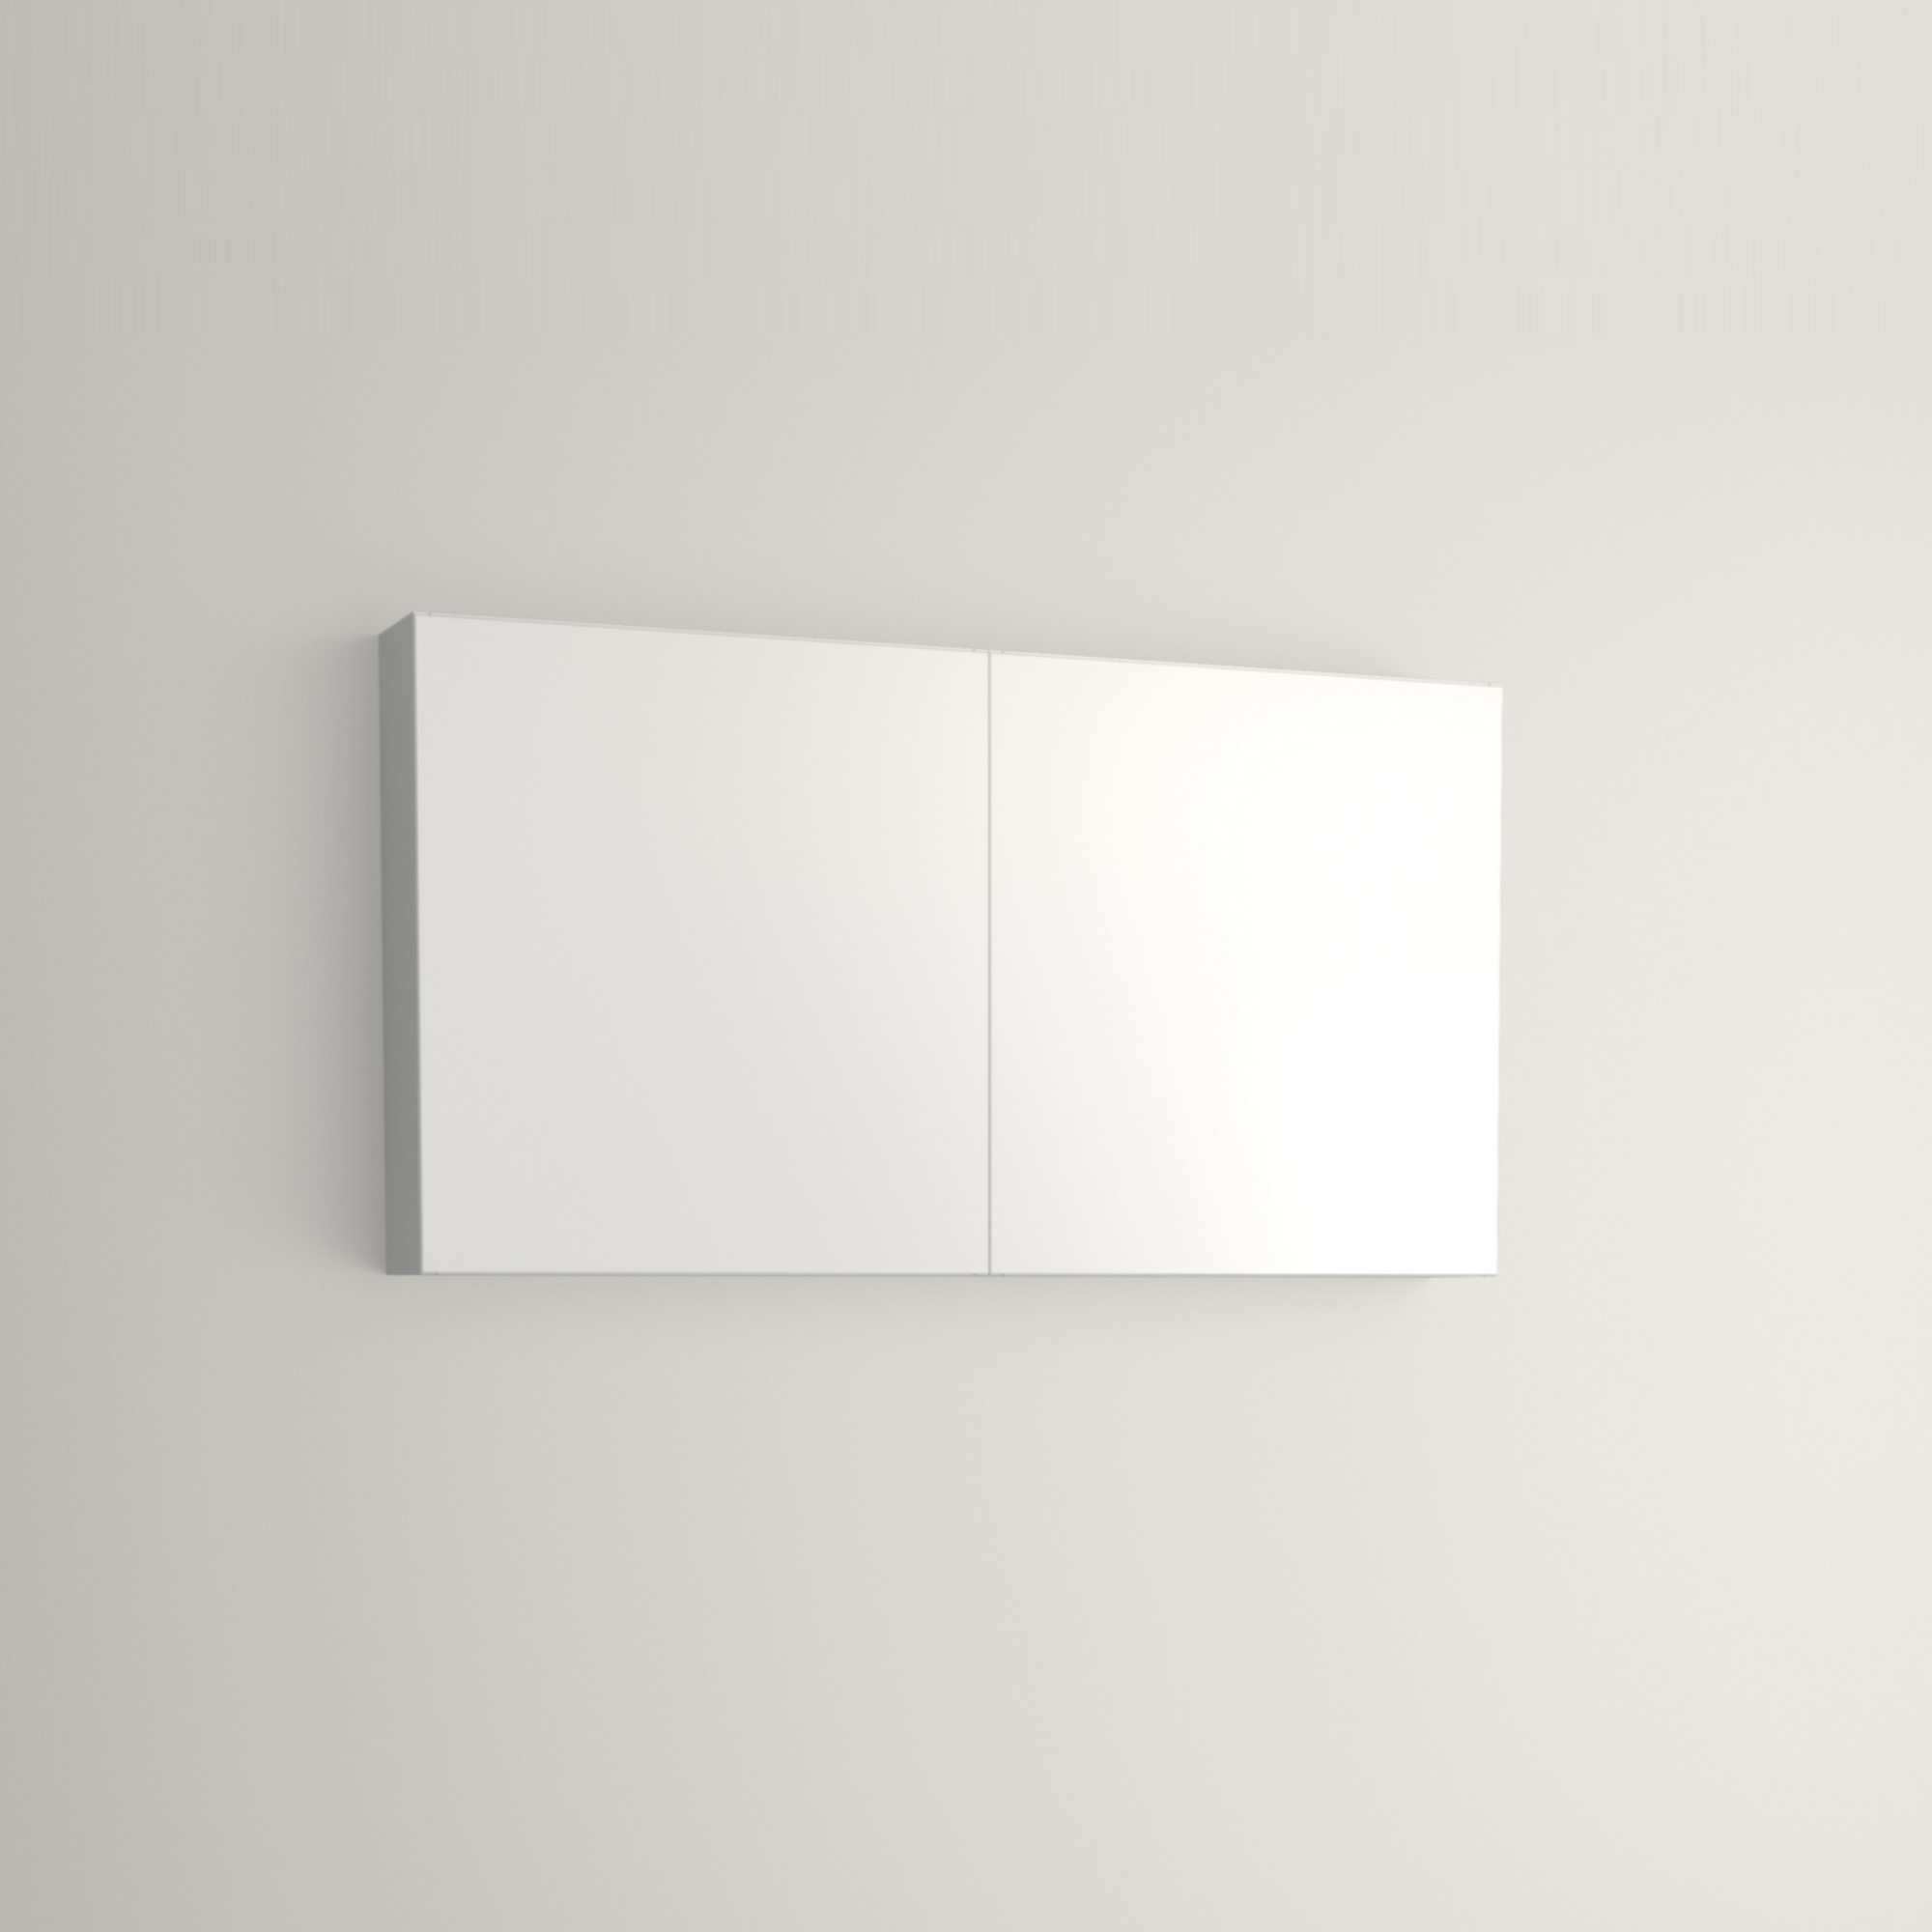 Spegelskåp Vedum Free/Mezzo Plus med LED-belysning